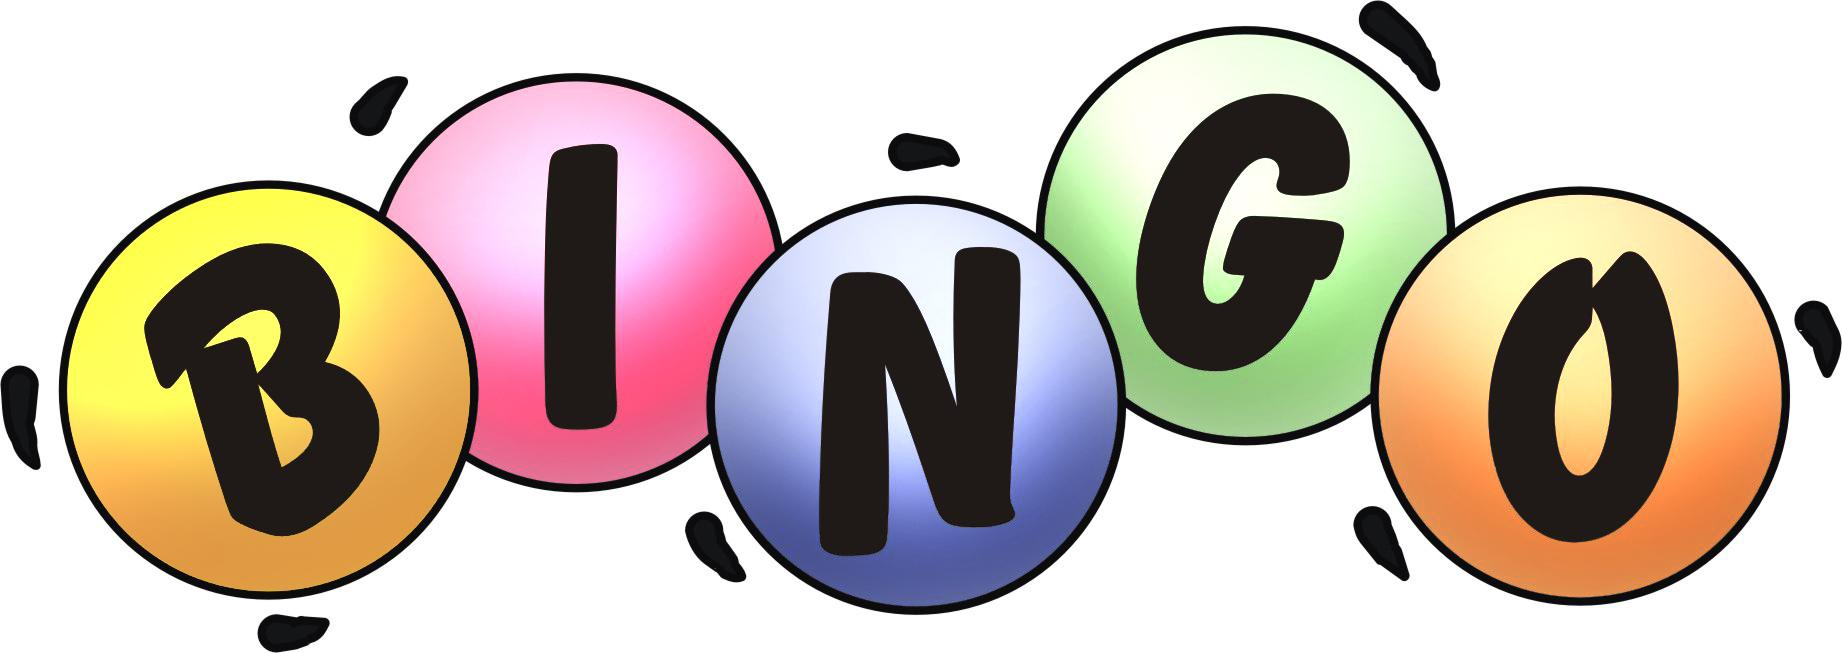 Bingo Cancelled On Friday 3 15 And Friday 2 29 Pelhamseniorsblog